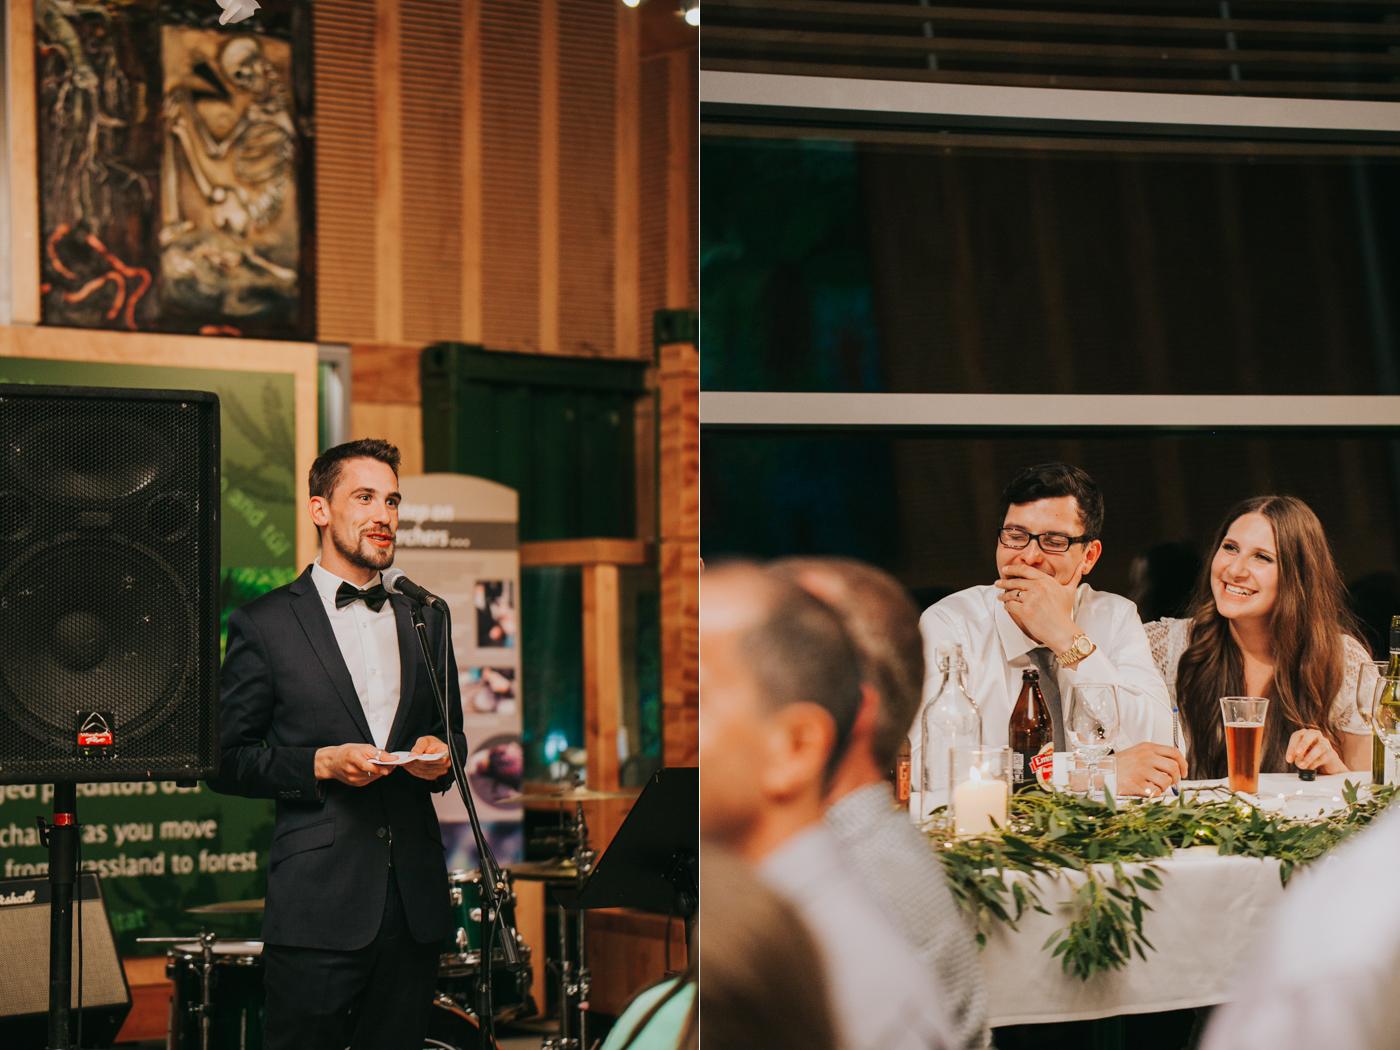 Ariana & Tim - Dunedin, New Zealand Wedding - Destination Wedding - Samantha Heather Photography-269.jpg